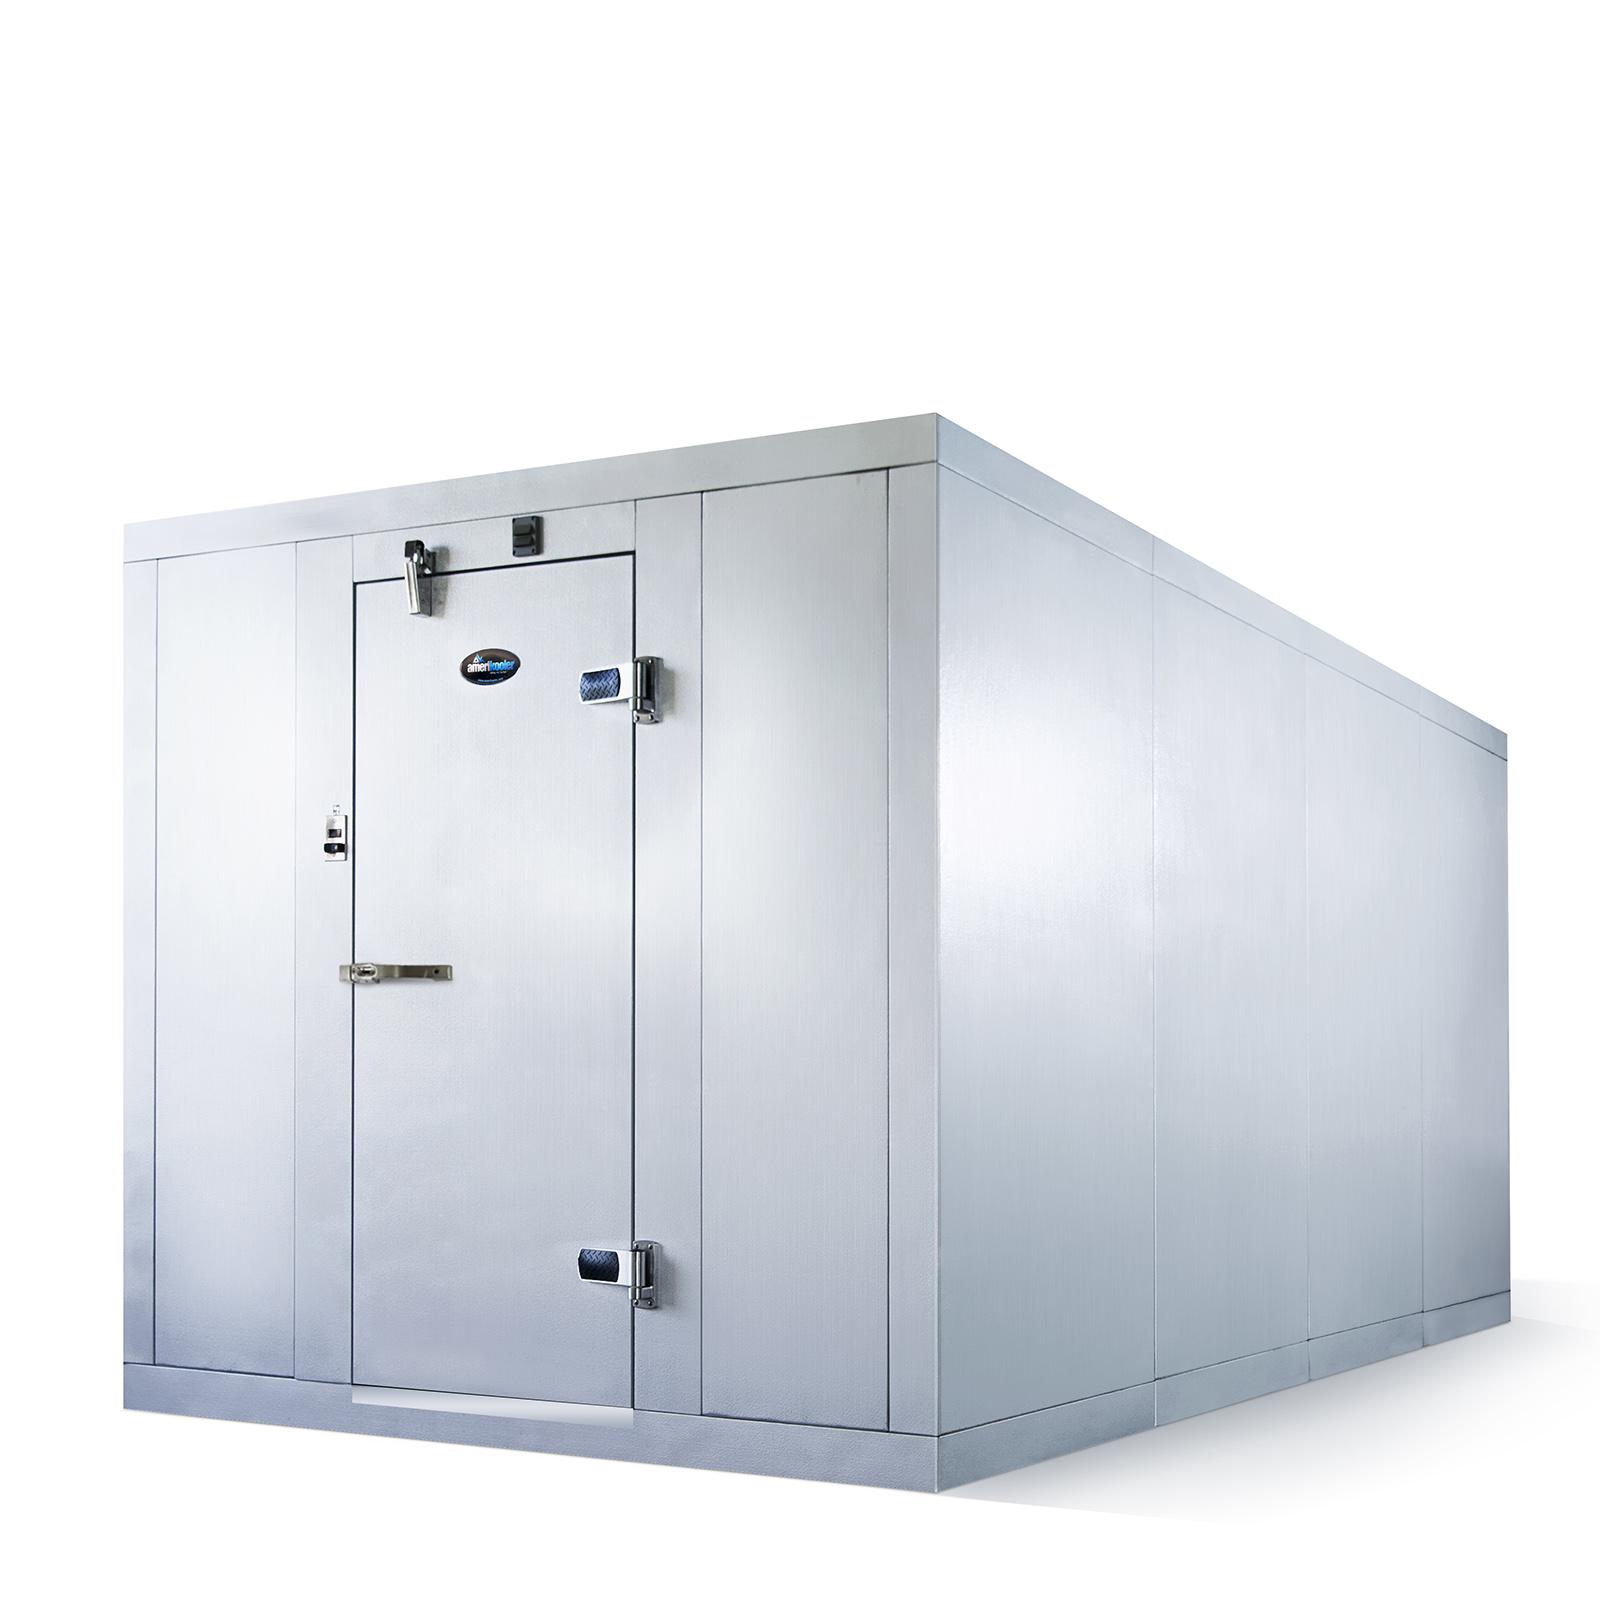 AmeriKooler QF081277**FBRM walk in freezer, modular, remote